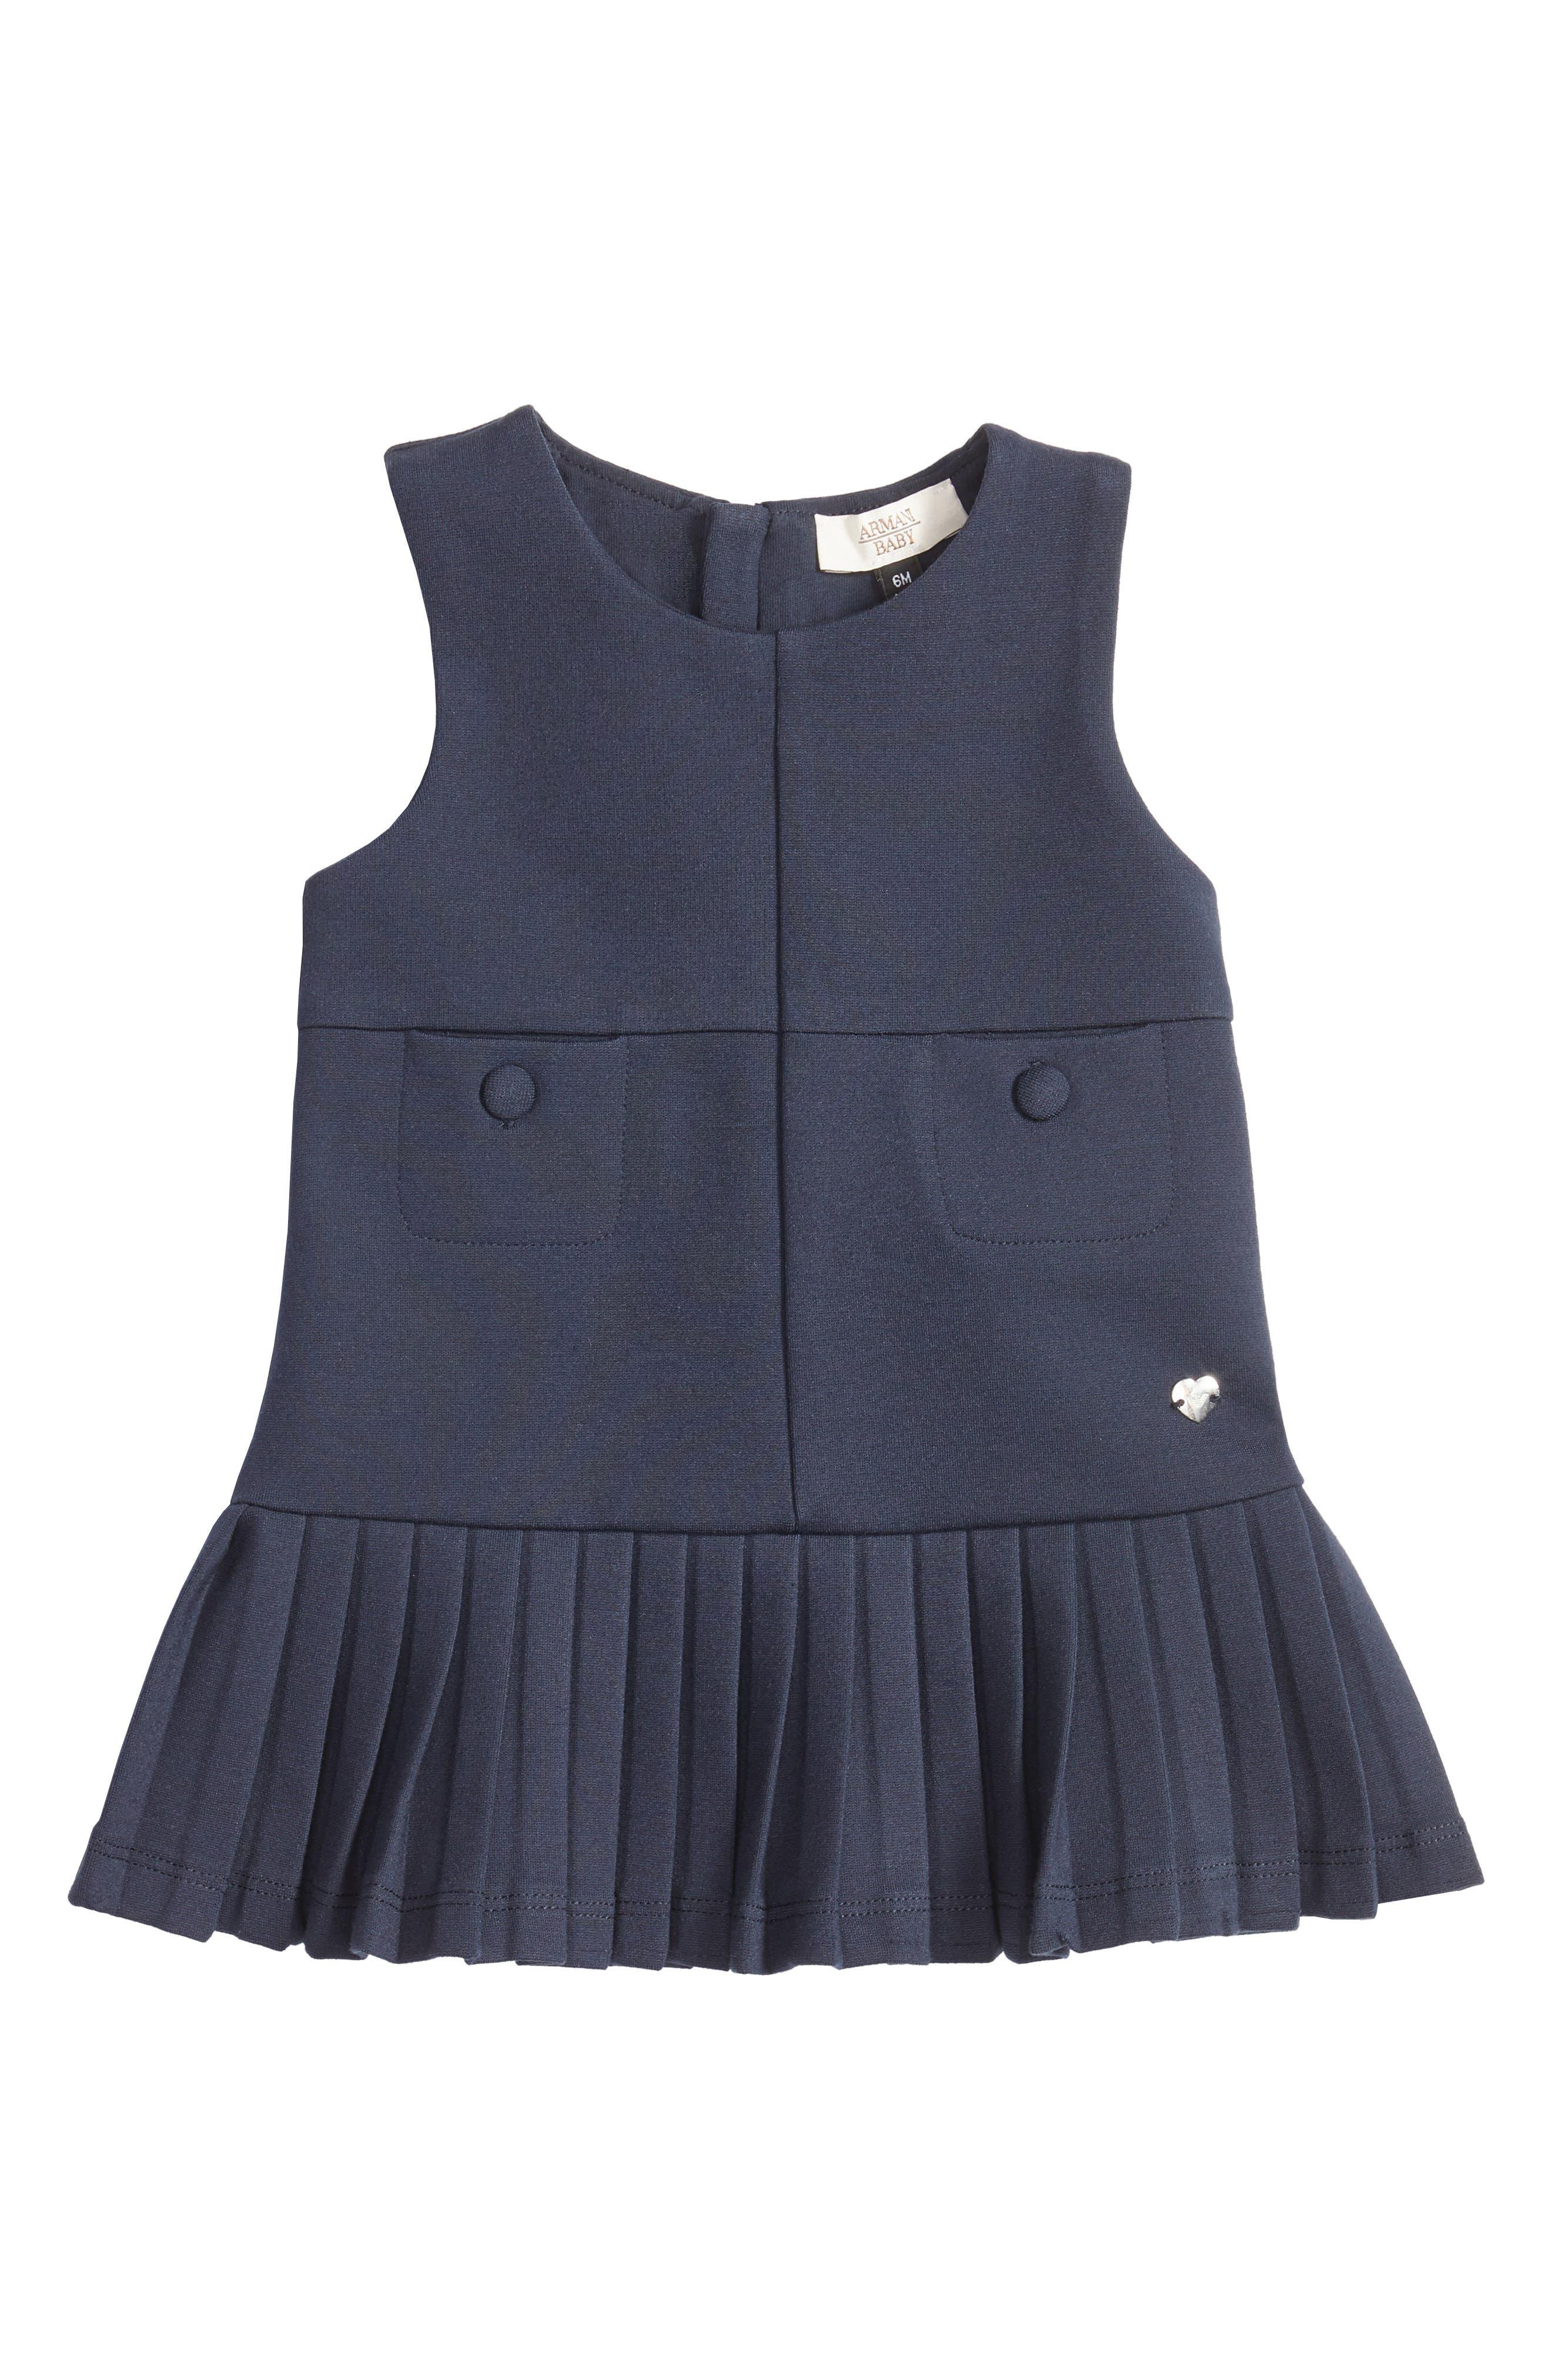 Sleeveless Jersey Dress,                         Main,                         color, Navy Blue